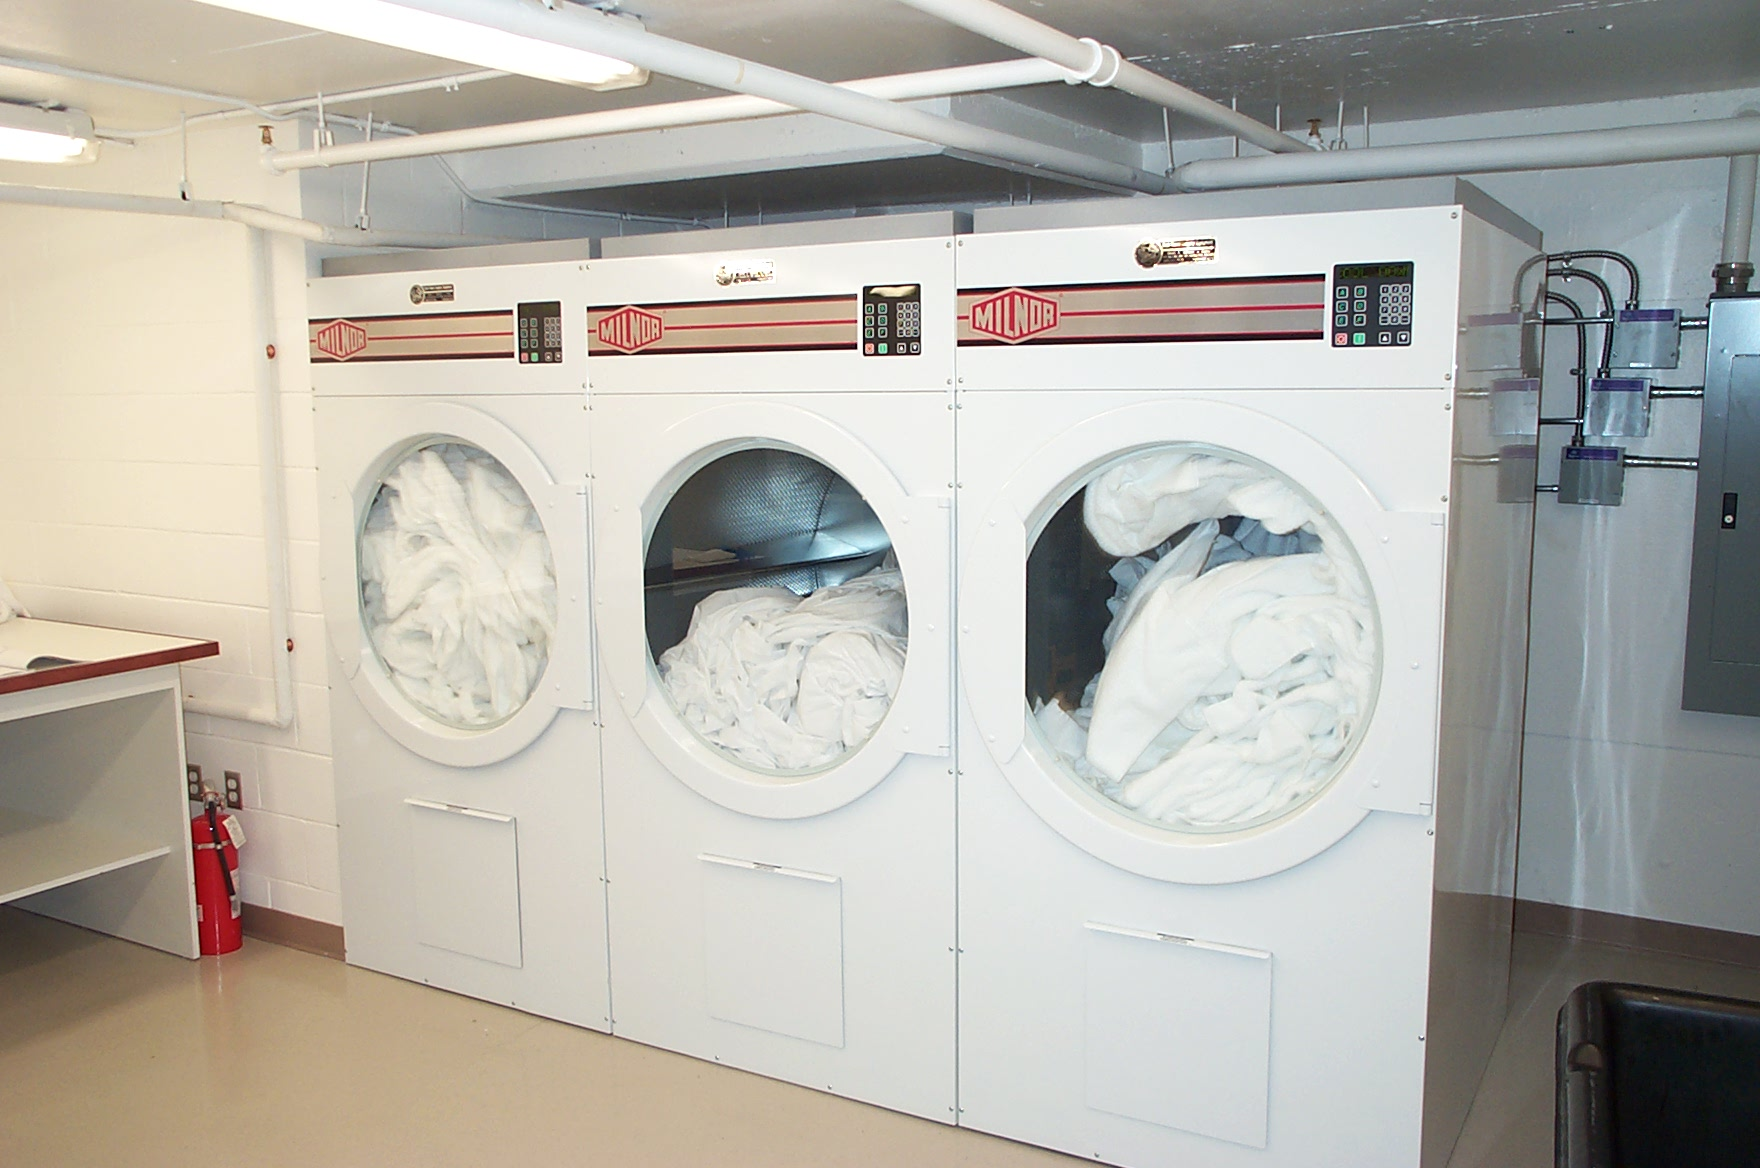 Milnor 4 Points Dryers.jpg